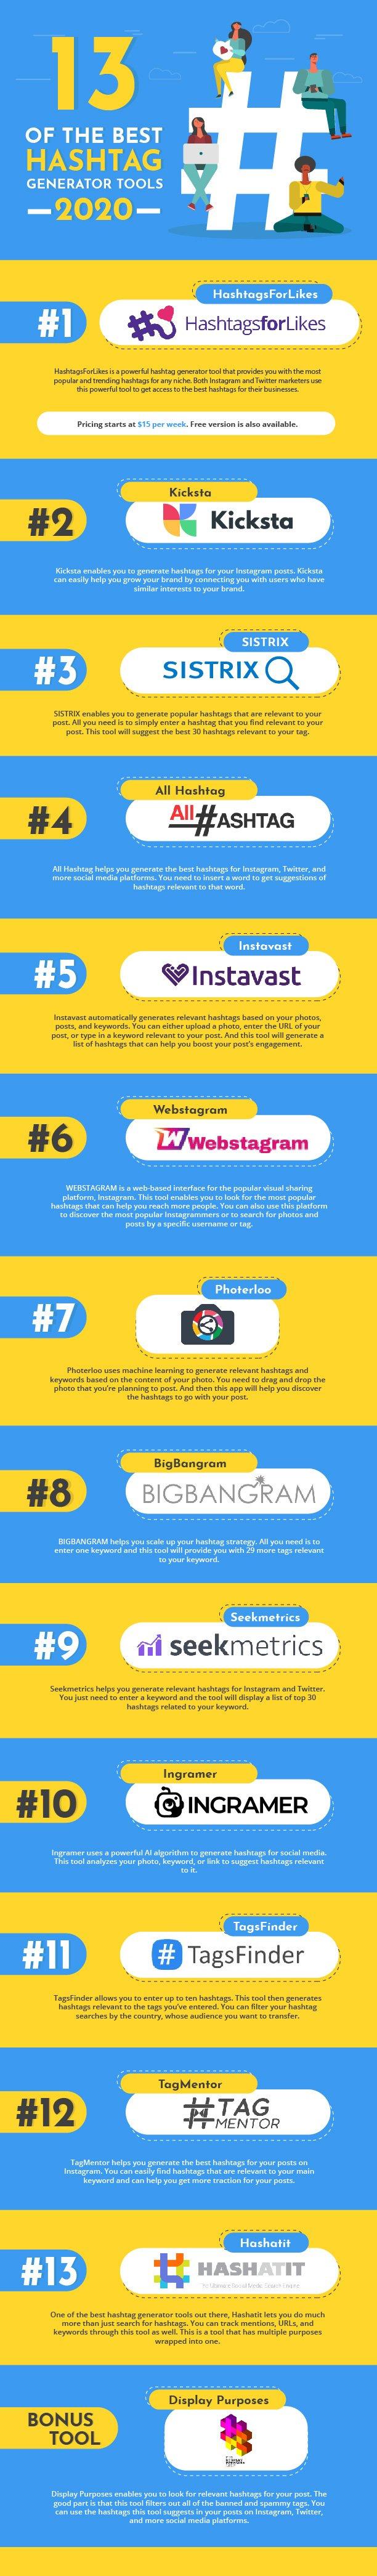 Hashtag generator tools